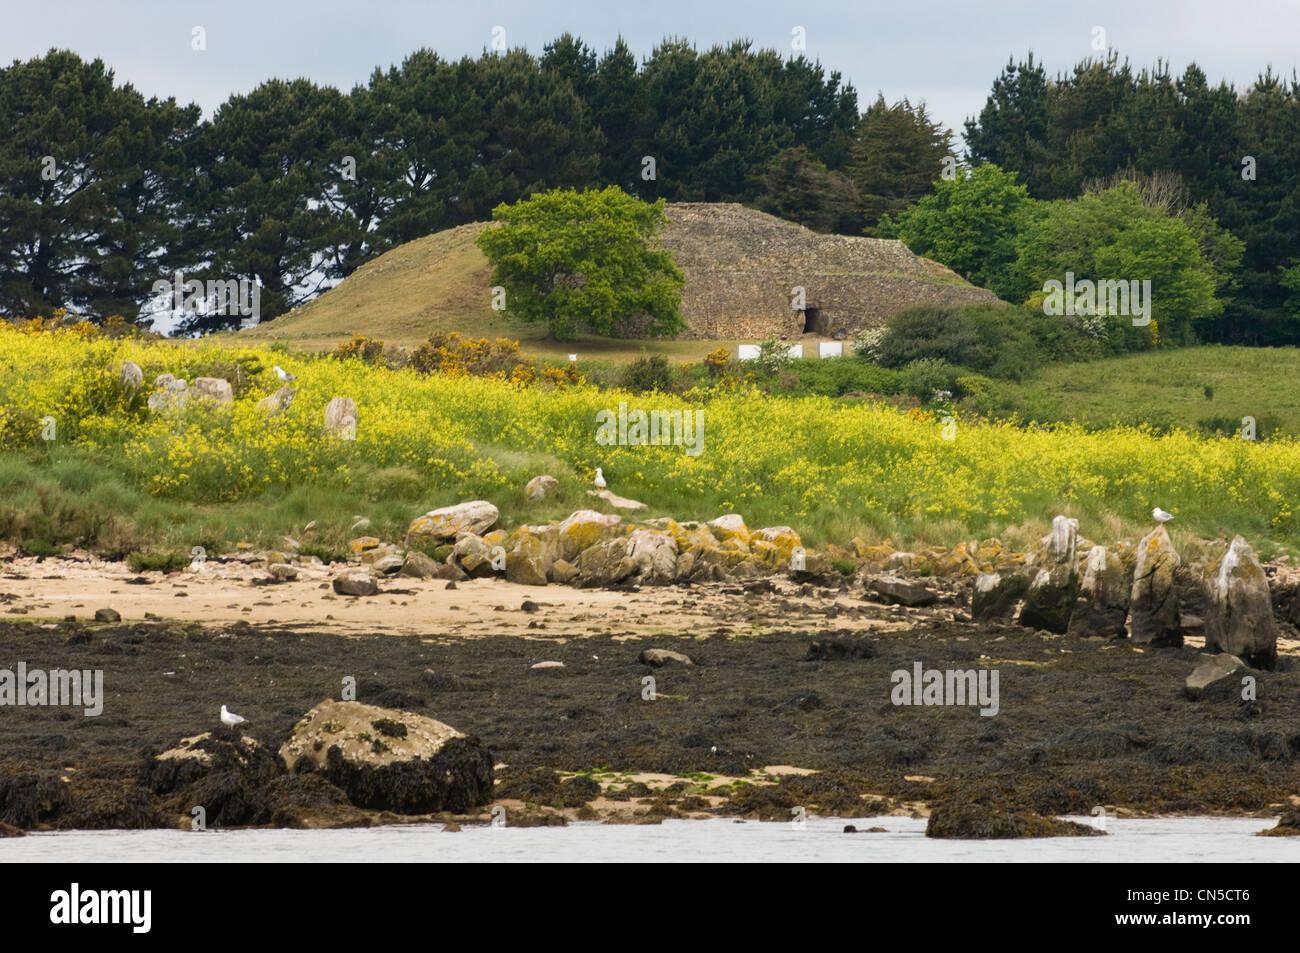 France, Morbihan, Golfe du Morbihan, Larmor Baden, cairn of Gavrinis island, whose slabs carved 50 centuries ago - Stock Image